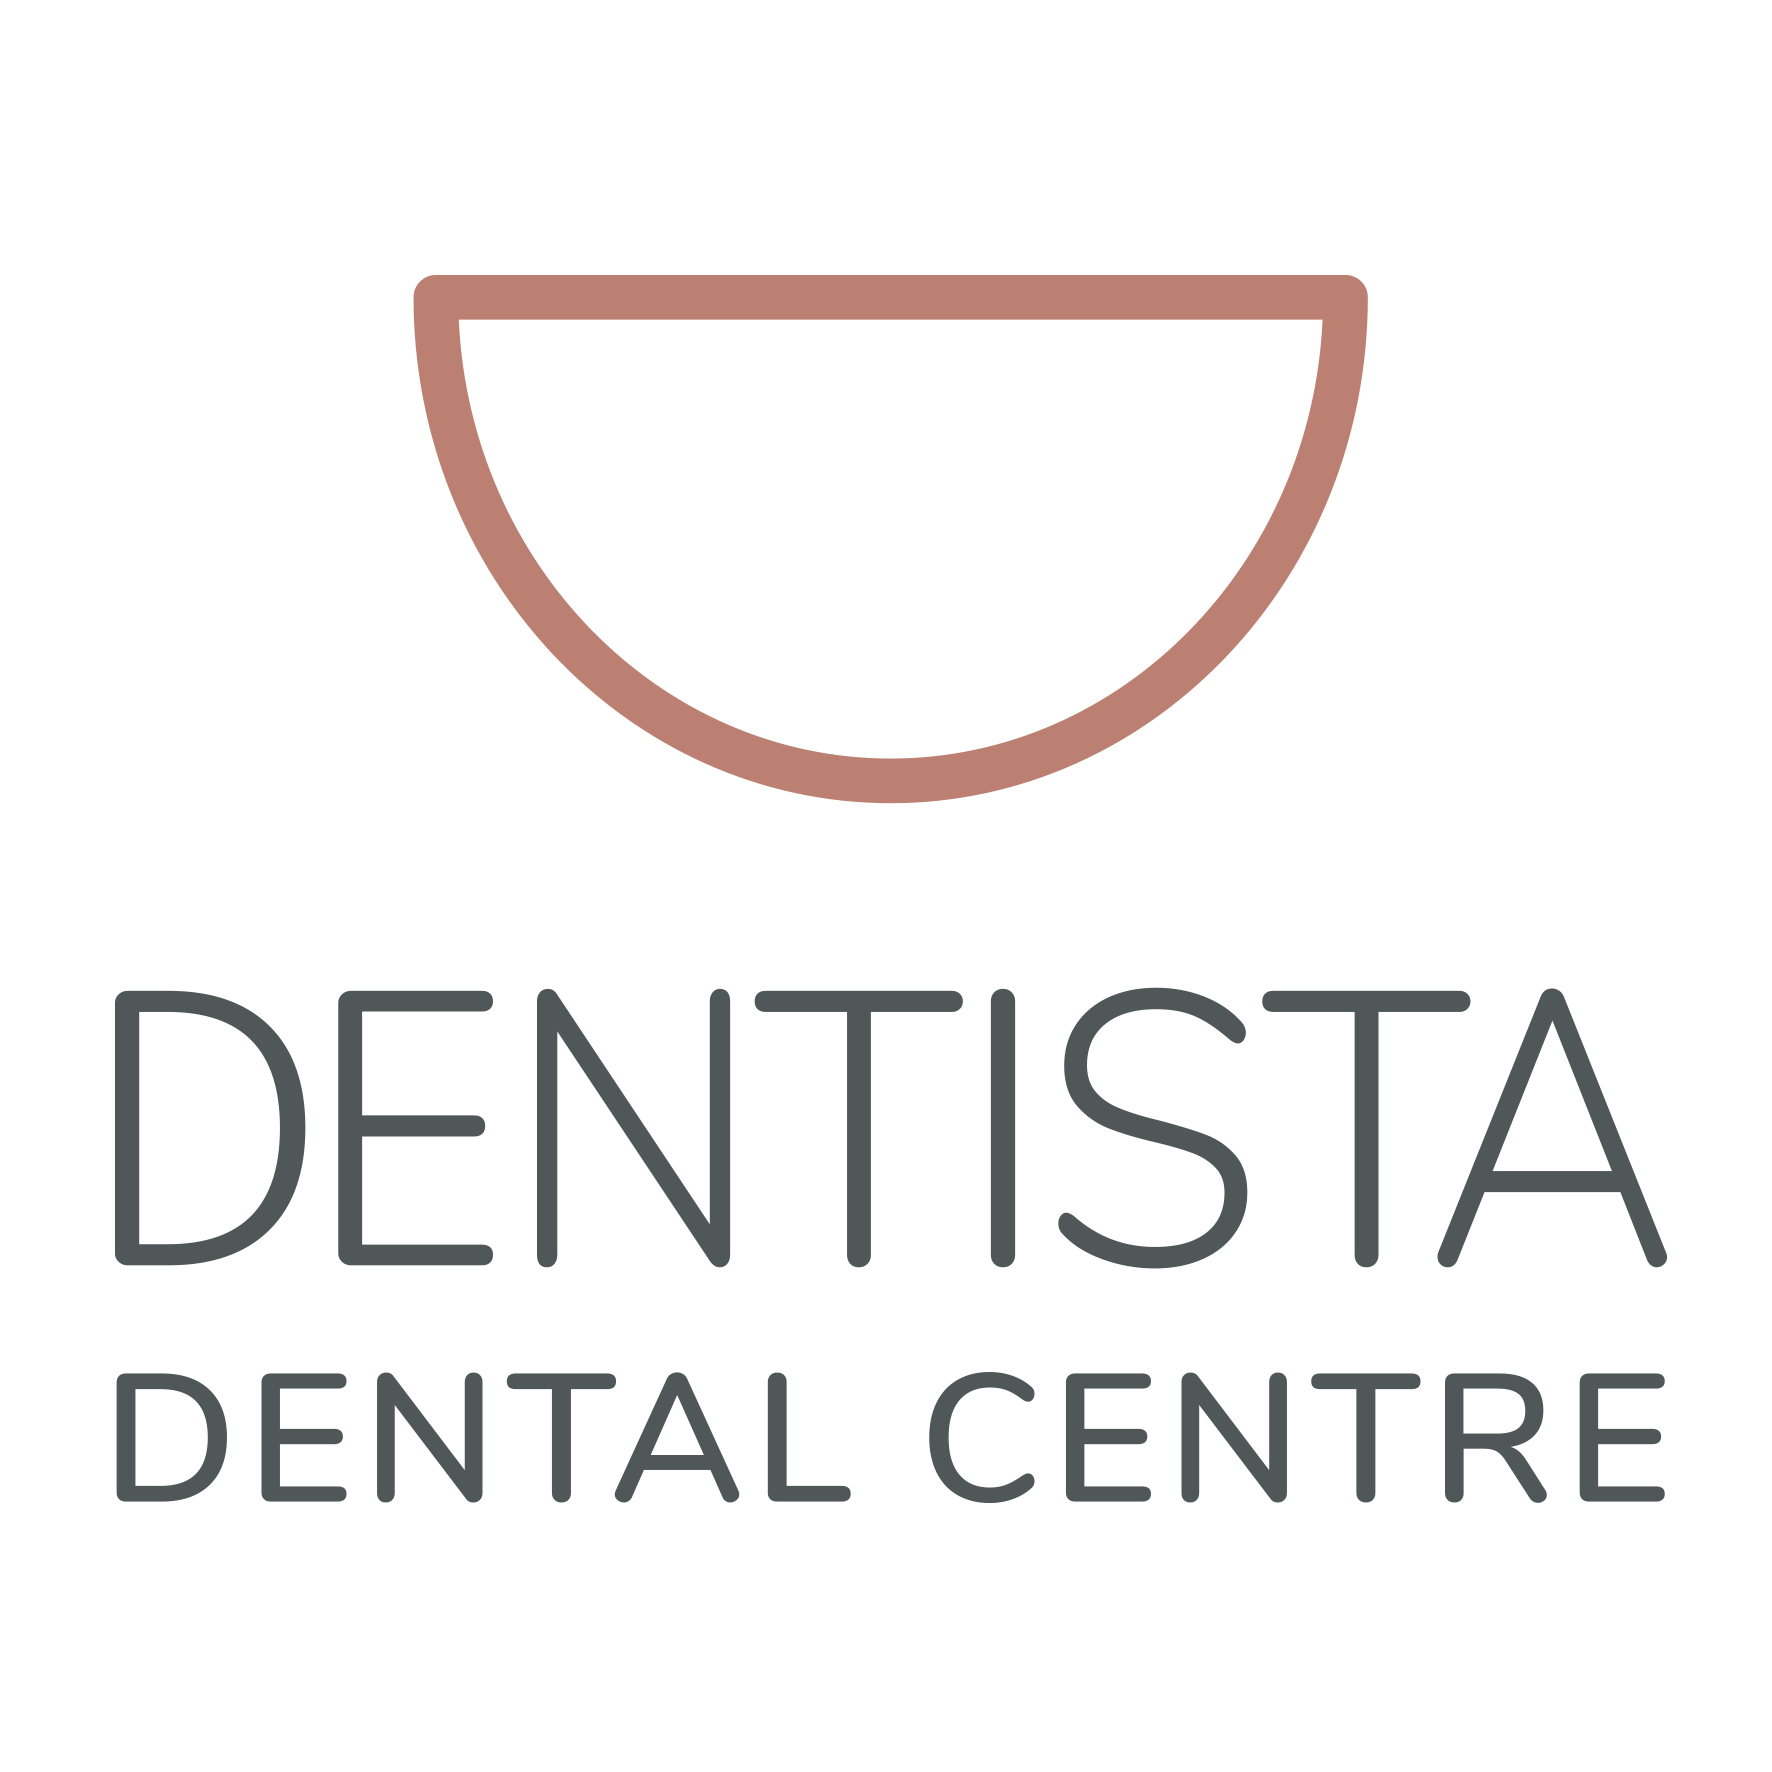 Dentista Dental Centre